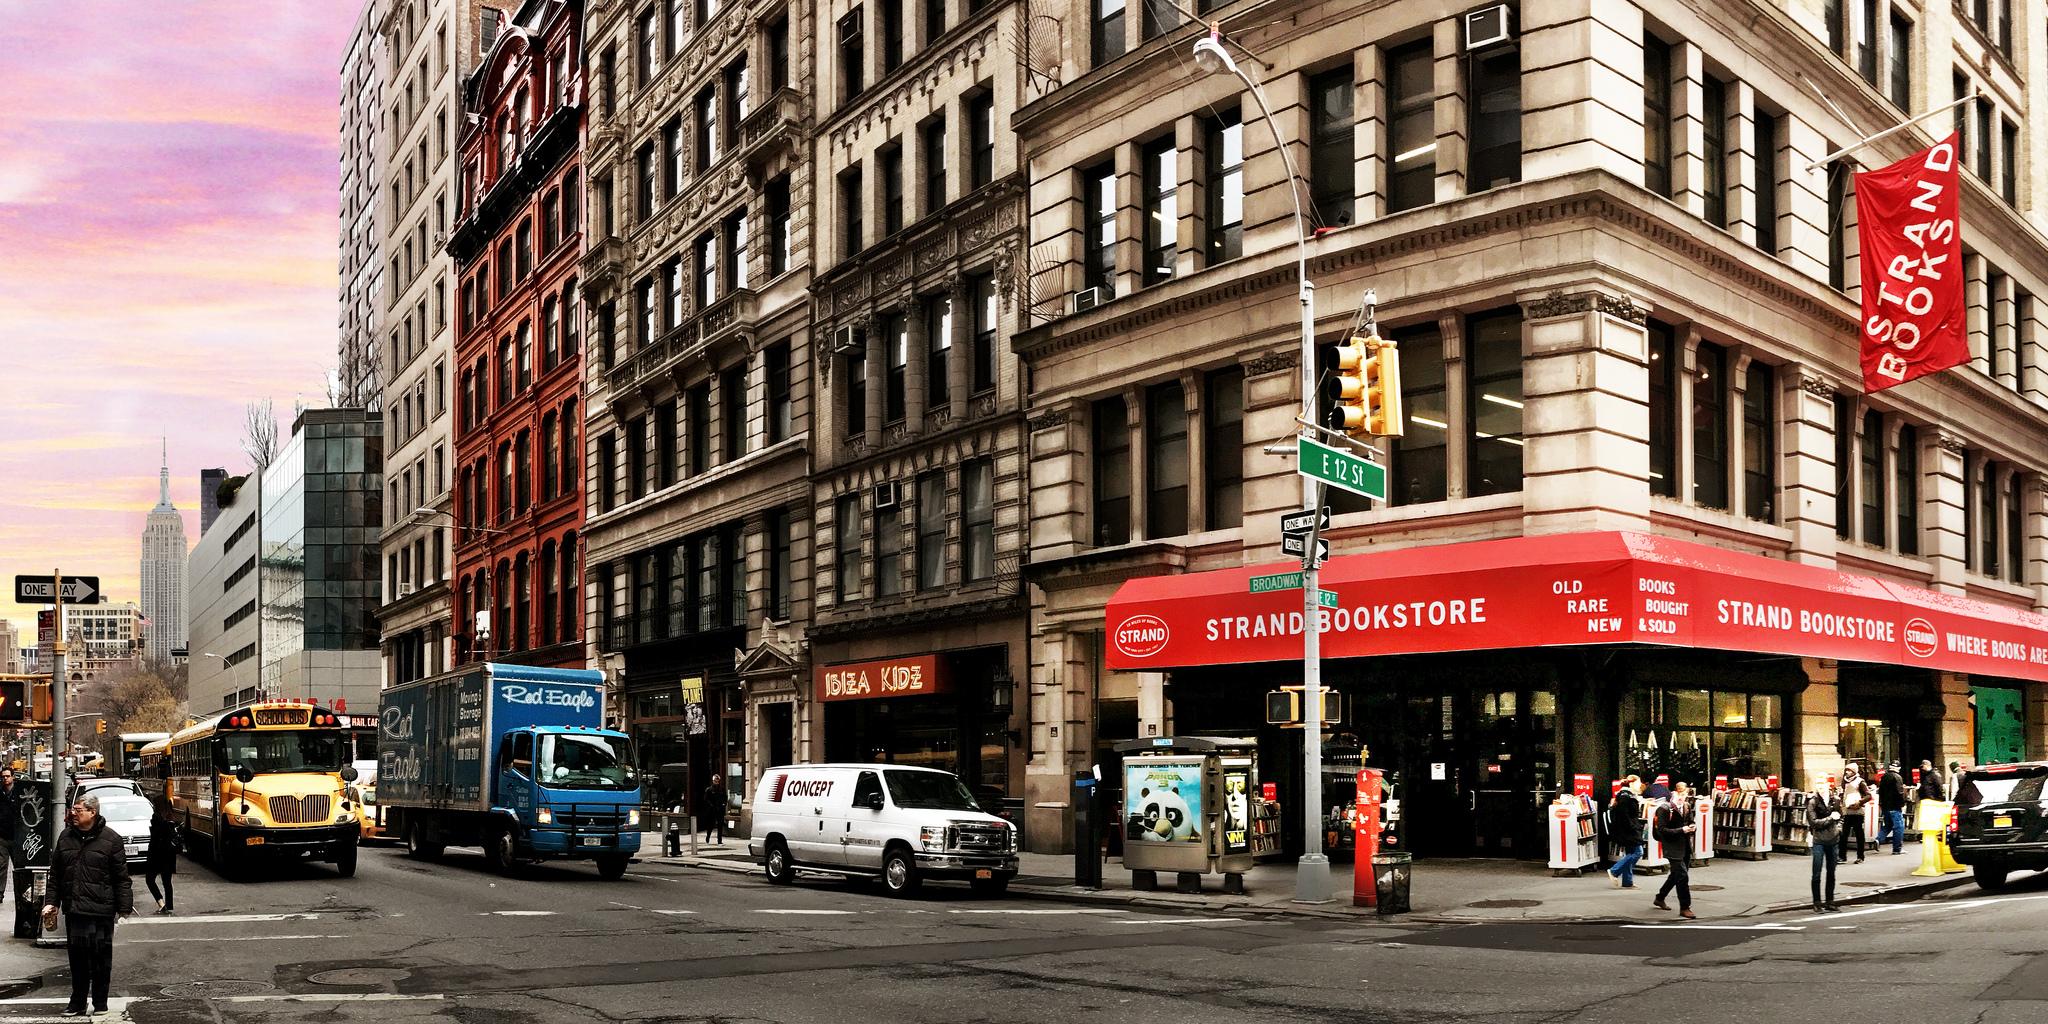 Strand Bookstore en Nueva York. Foto Tyler Merbler - www.flickr.com